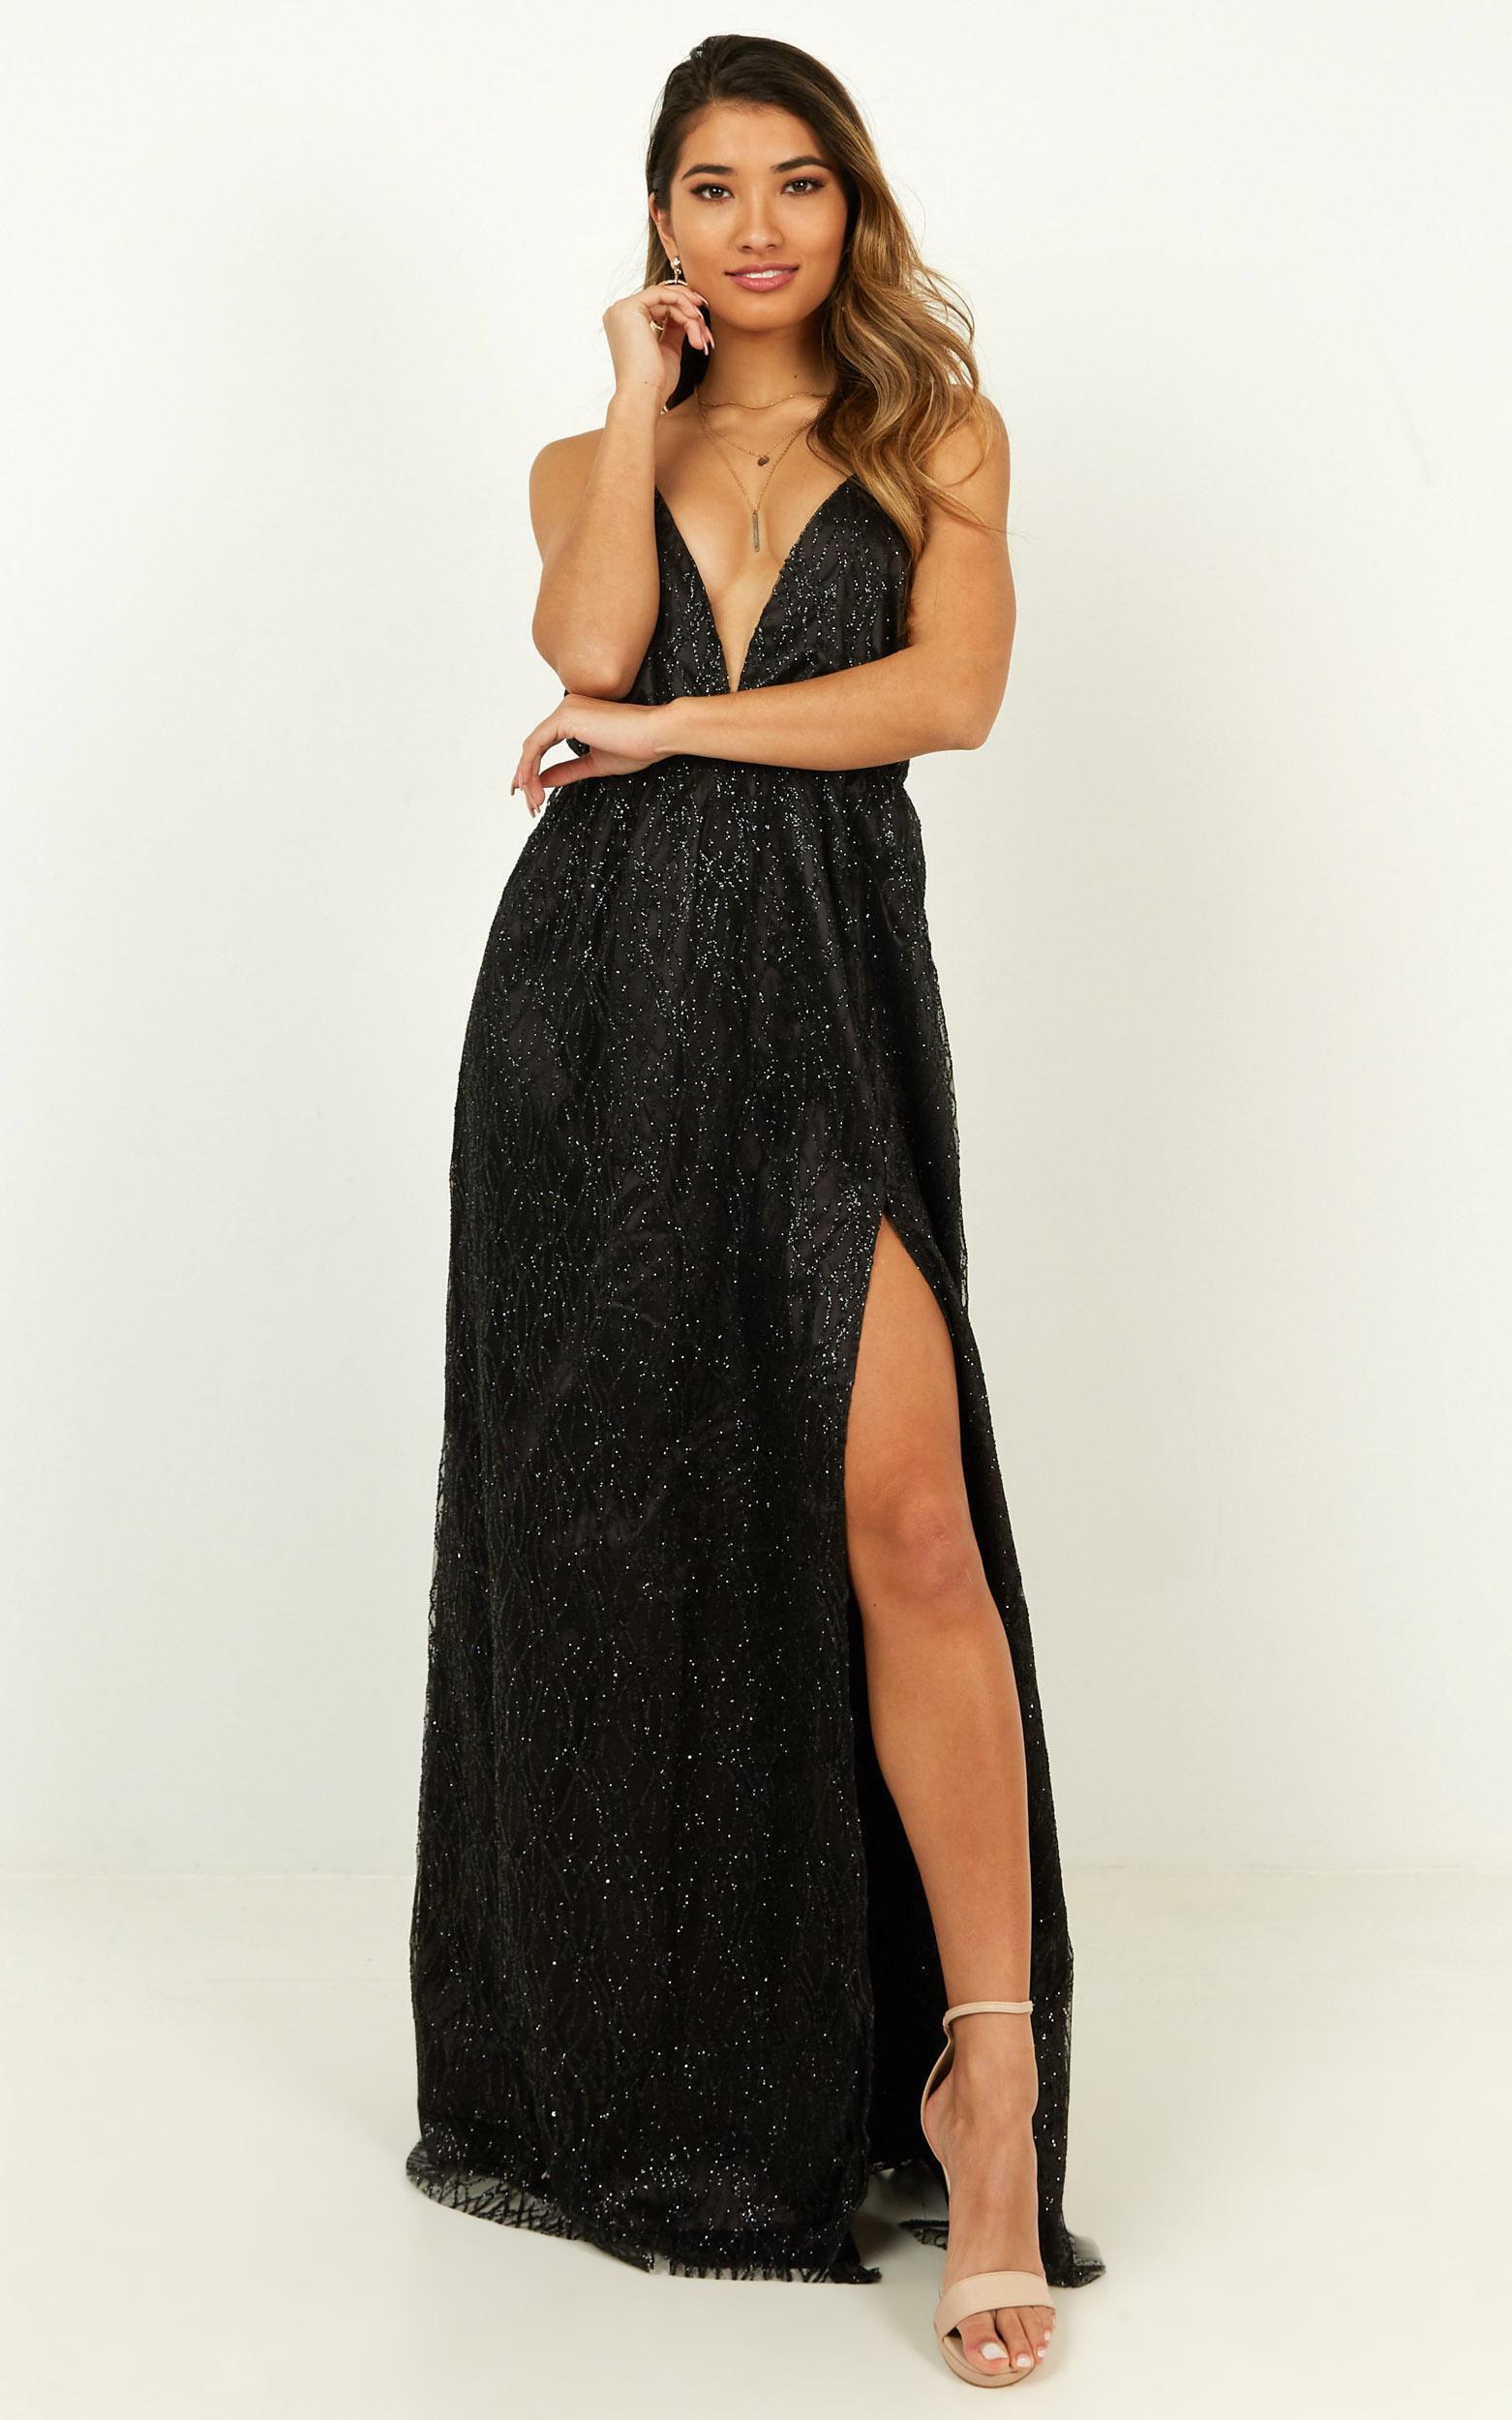 Pixi Love Maxi Dress in black glitter - 14 (XL), Black, hi-res image number null